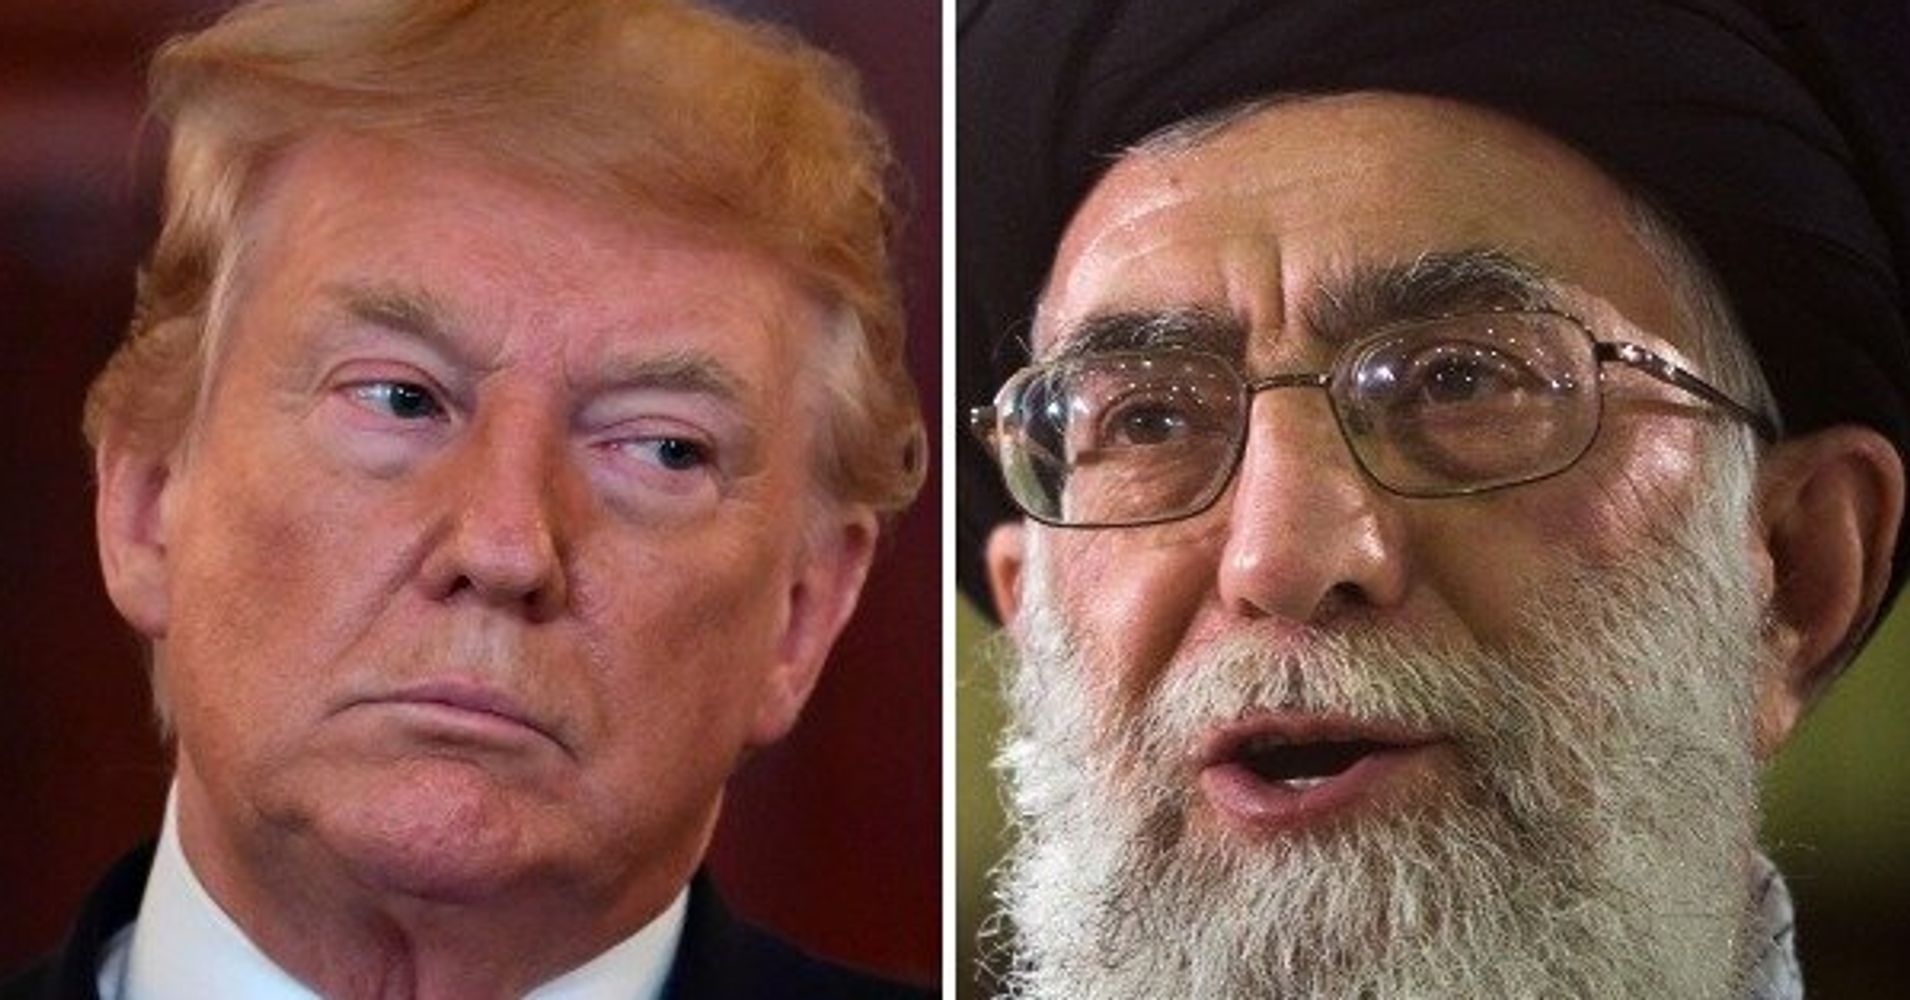 New U.S. Sanctions Mean 'Permanent Closure' Of Diplomacy, Iran Says thumbnail